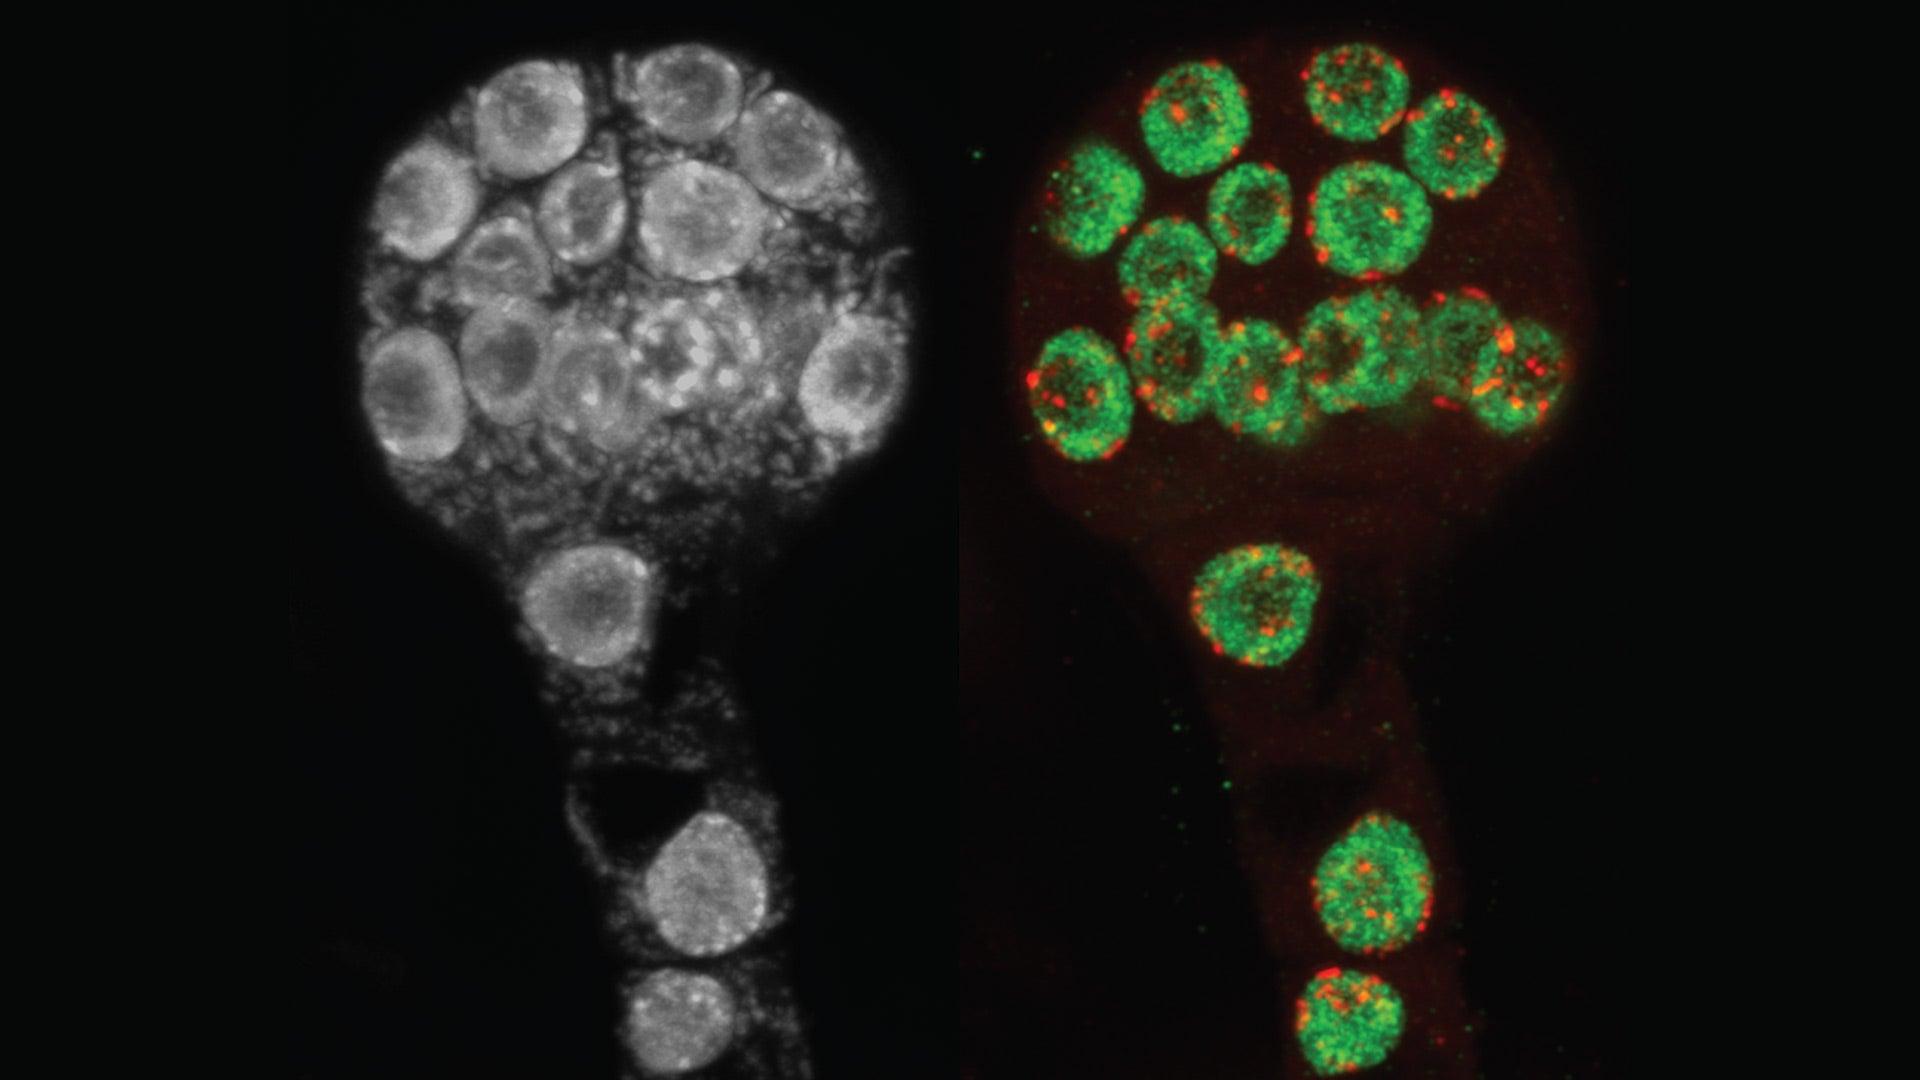 photo of Arabidopsis thaliana plant embryos